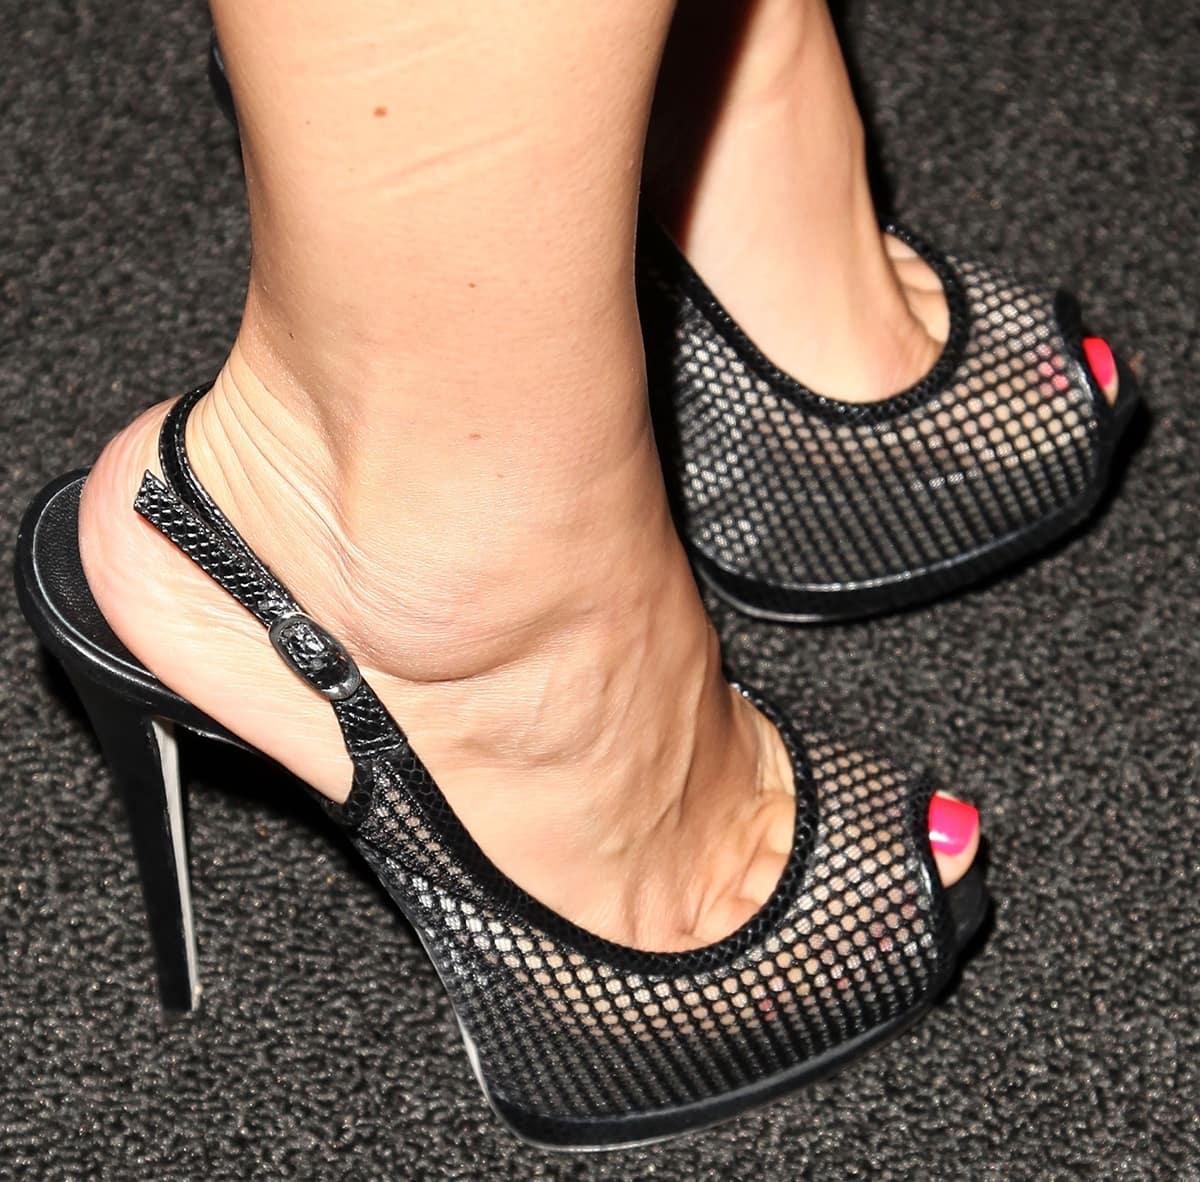 Giada De Laurentiis wears shoe size 6 (US) and loves showing off her feet in high heels